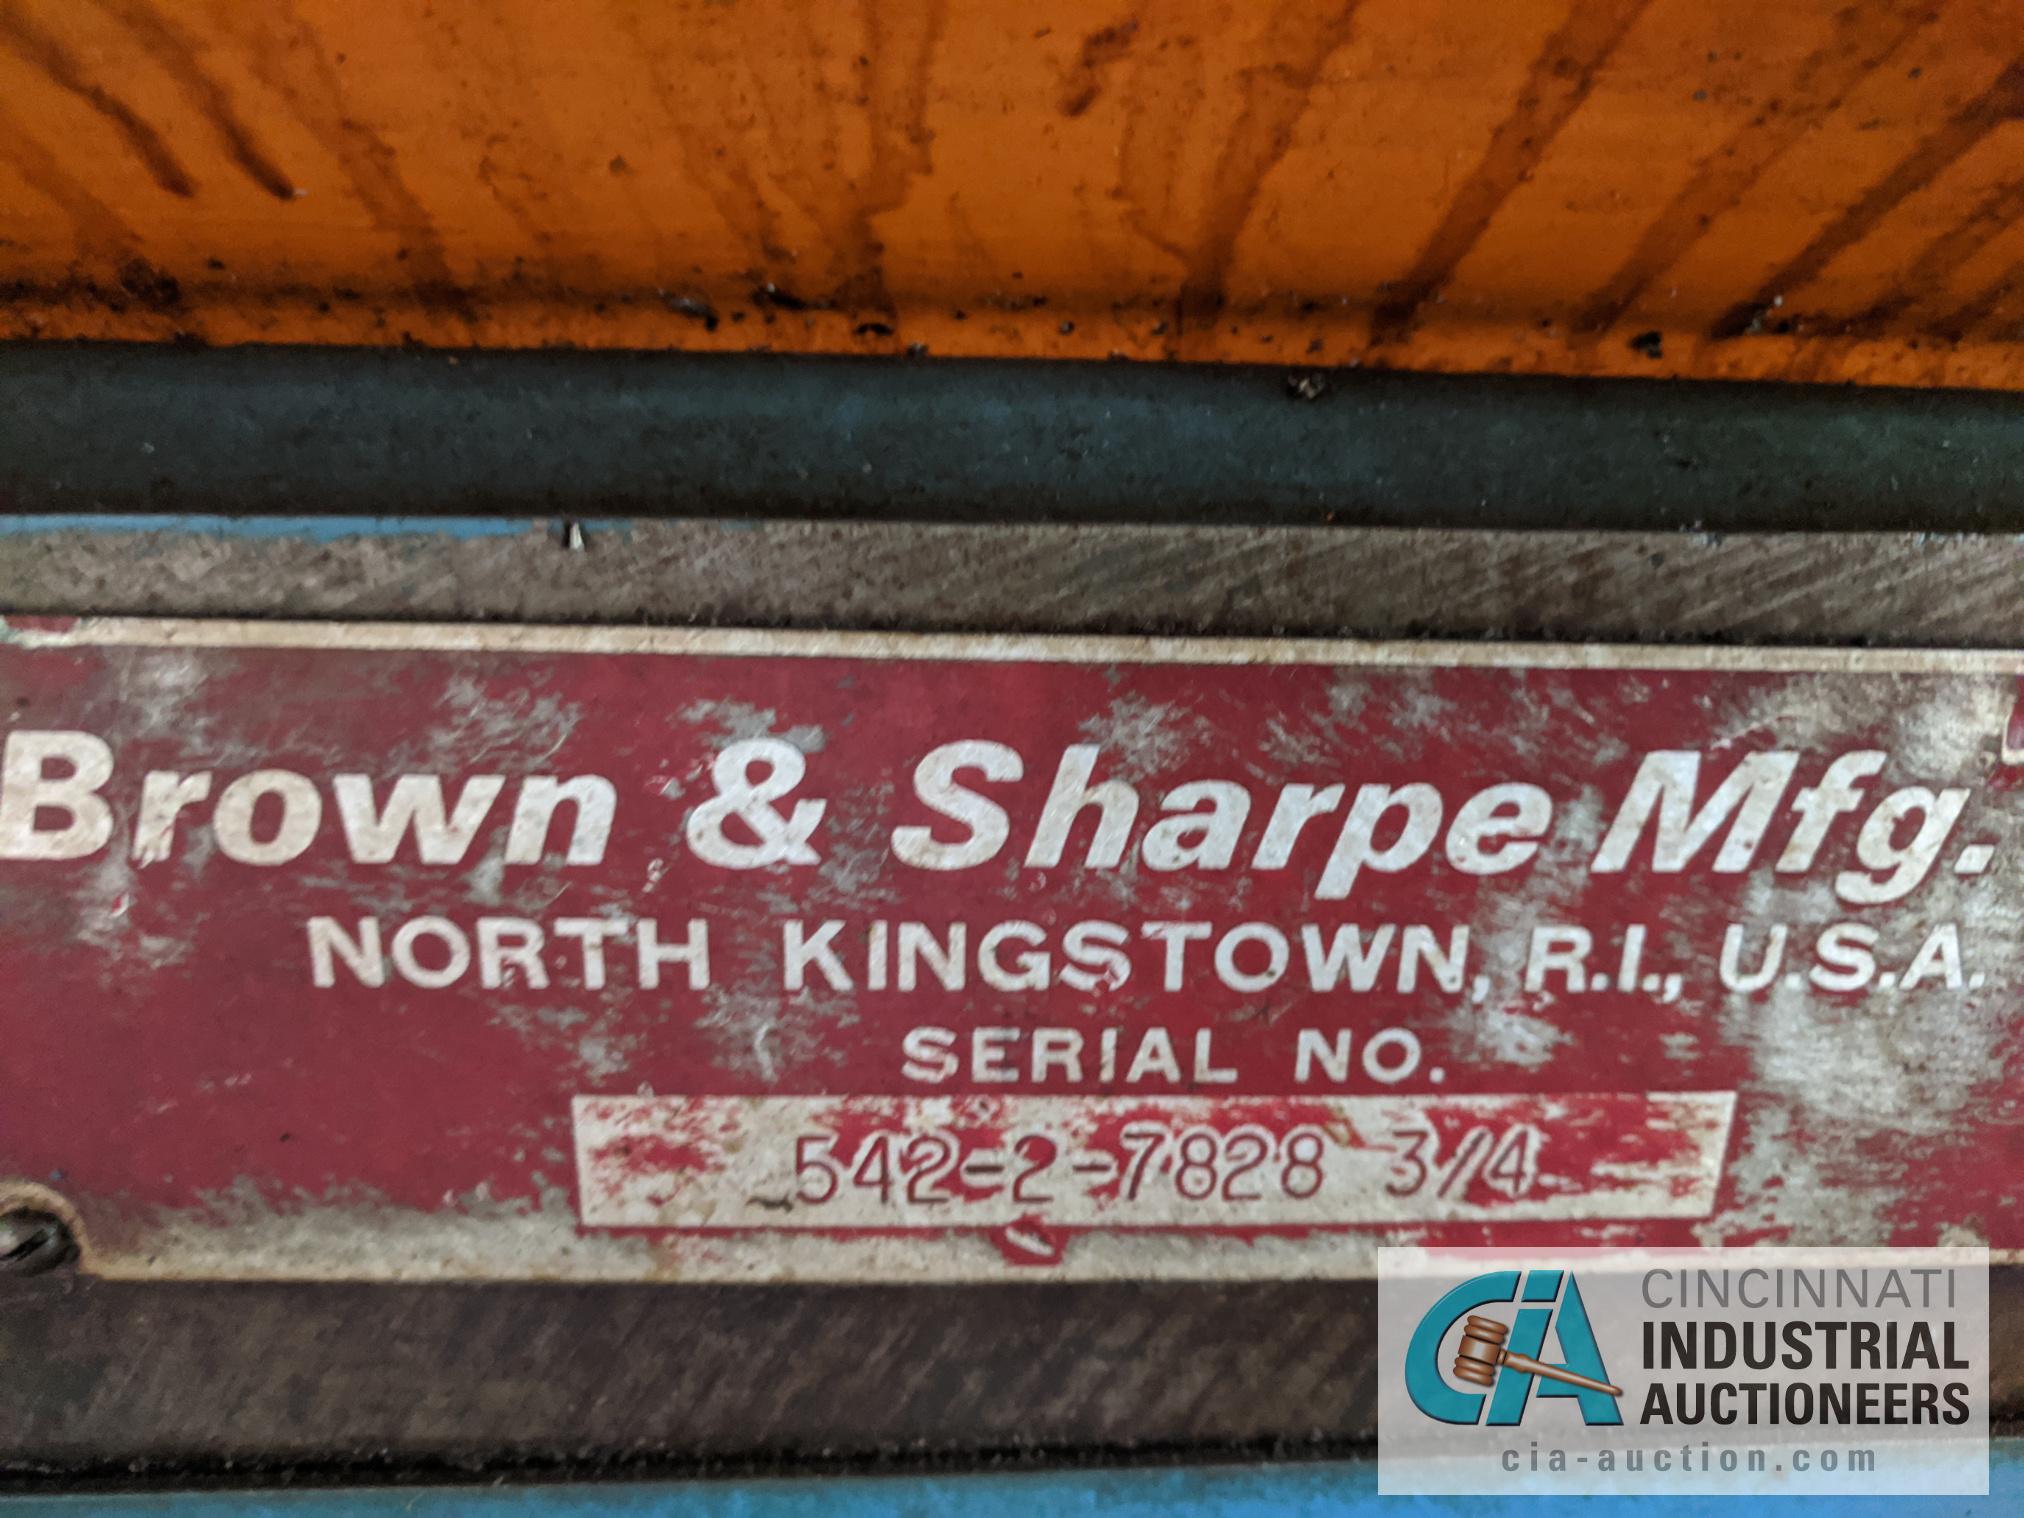 Lot 60 - BROWN AND SHARPE NO. 2 SCREW MACHINE S/N 542-2-7828